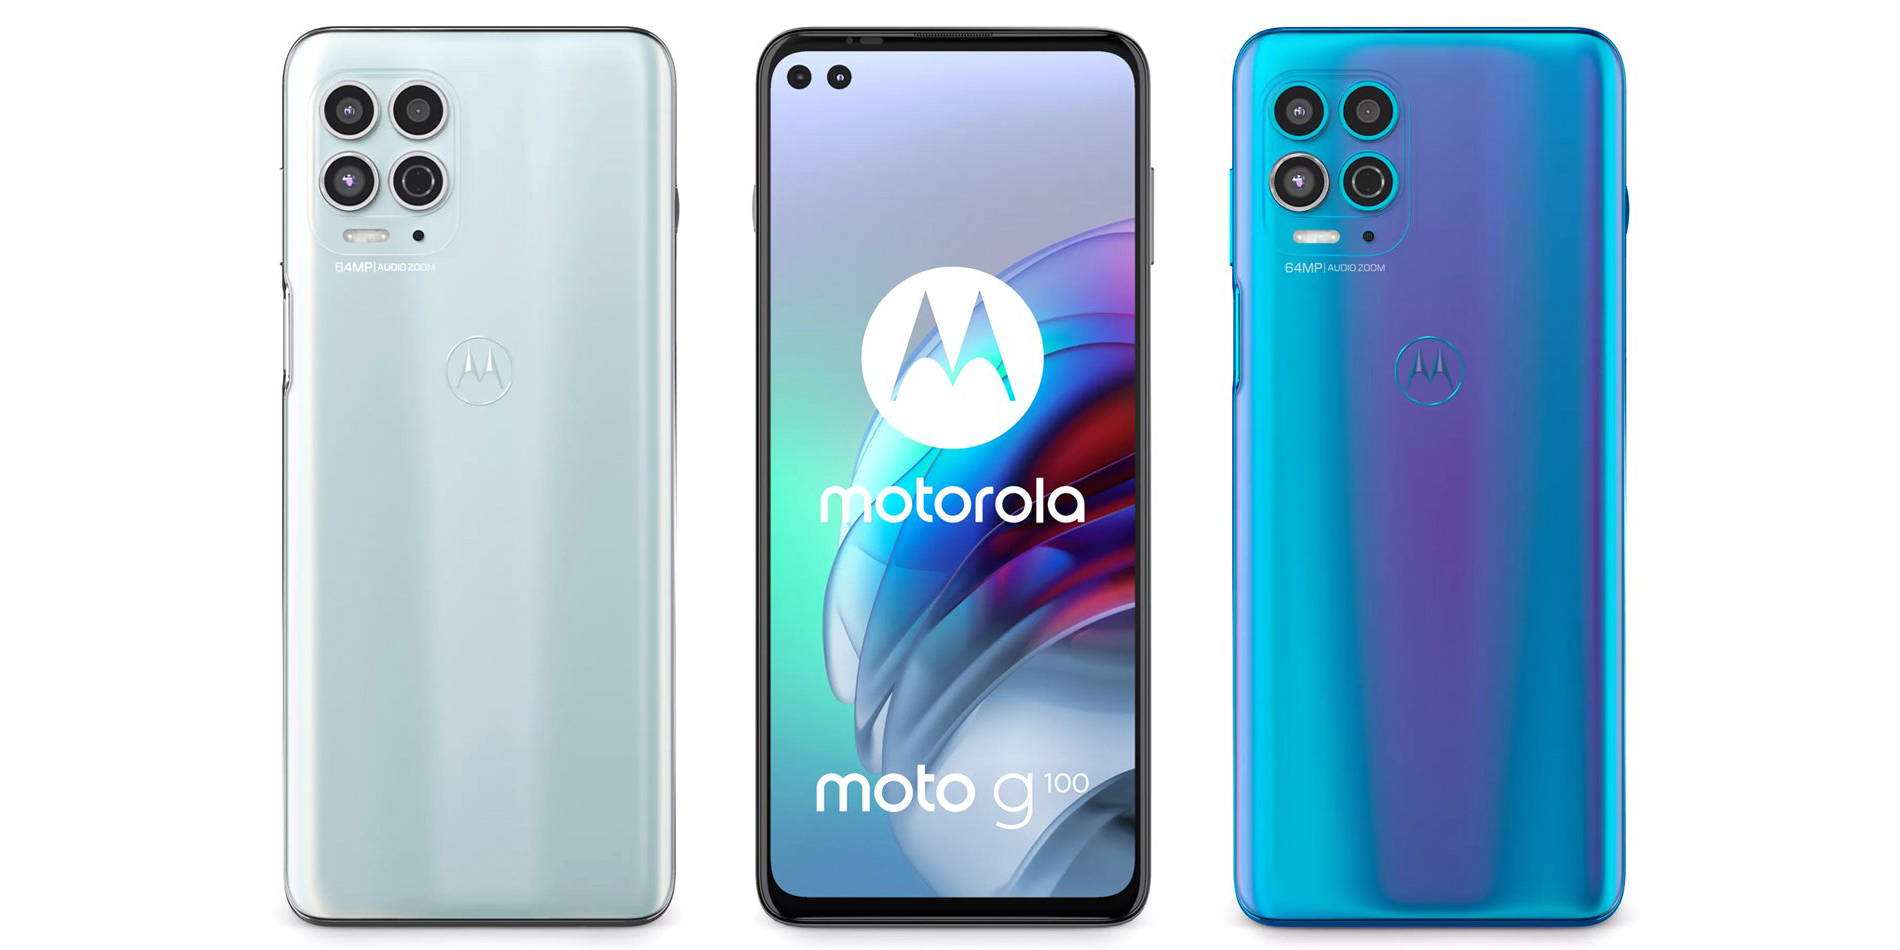 Motorola выпустила субфлагман Moto G100 со Snapdragon 870 и батарейкой на5000мА·ч